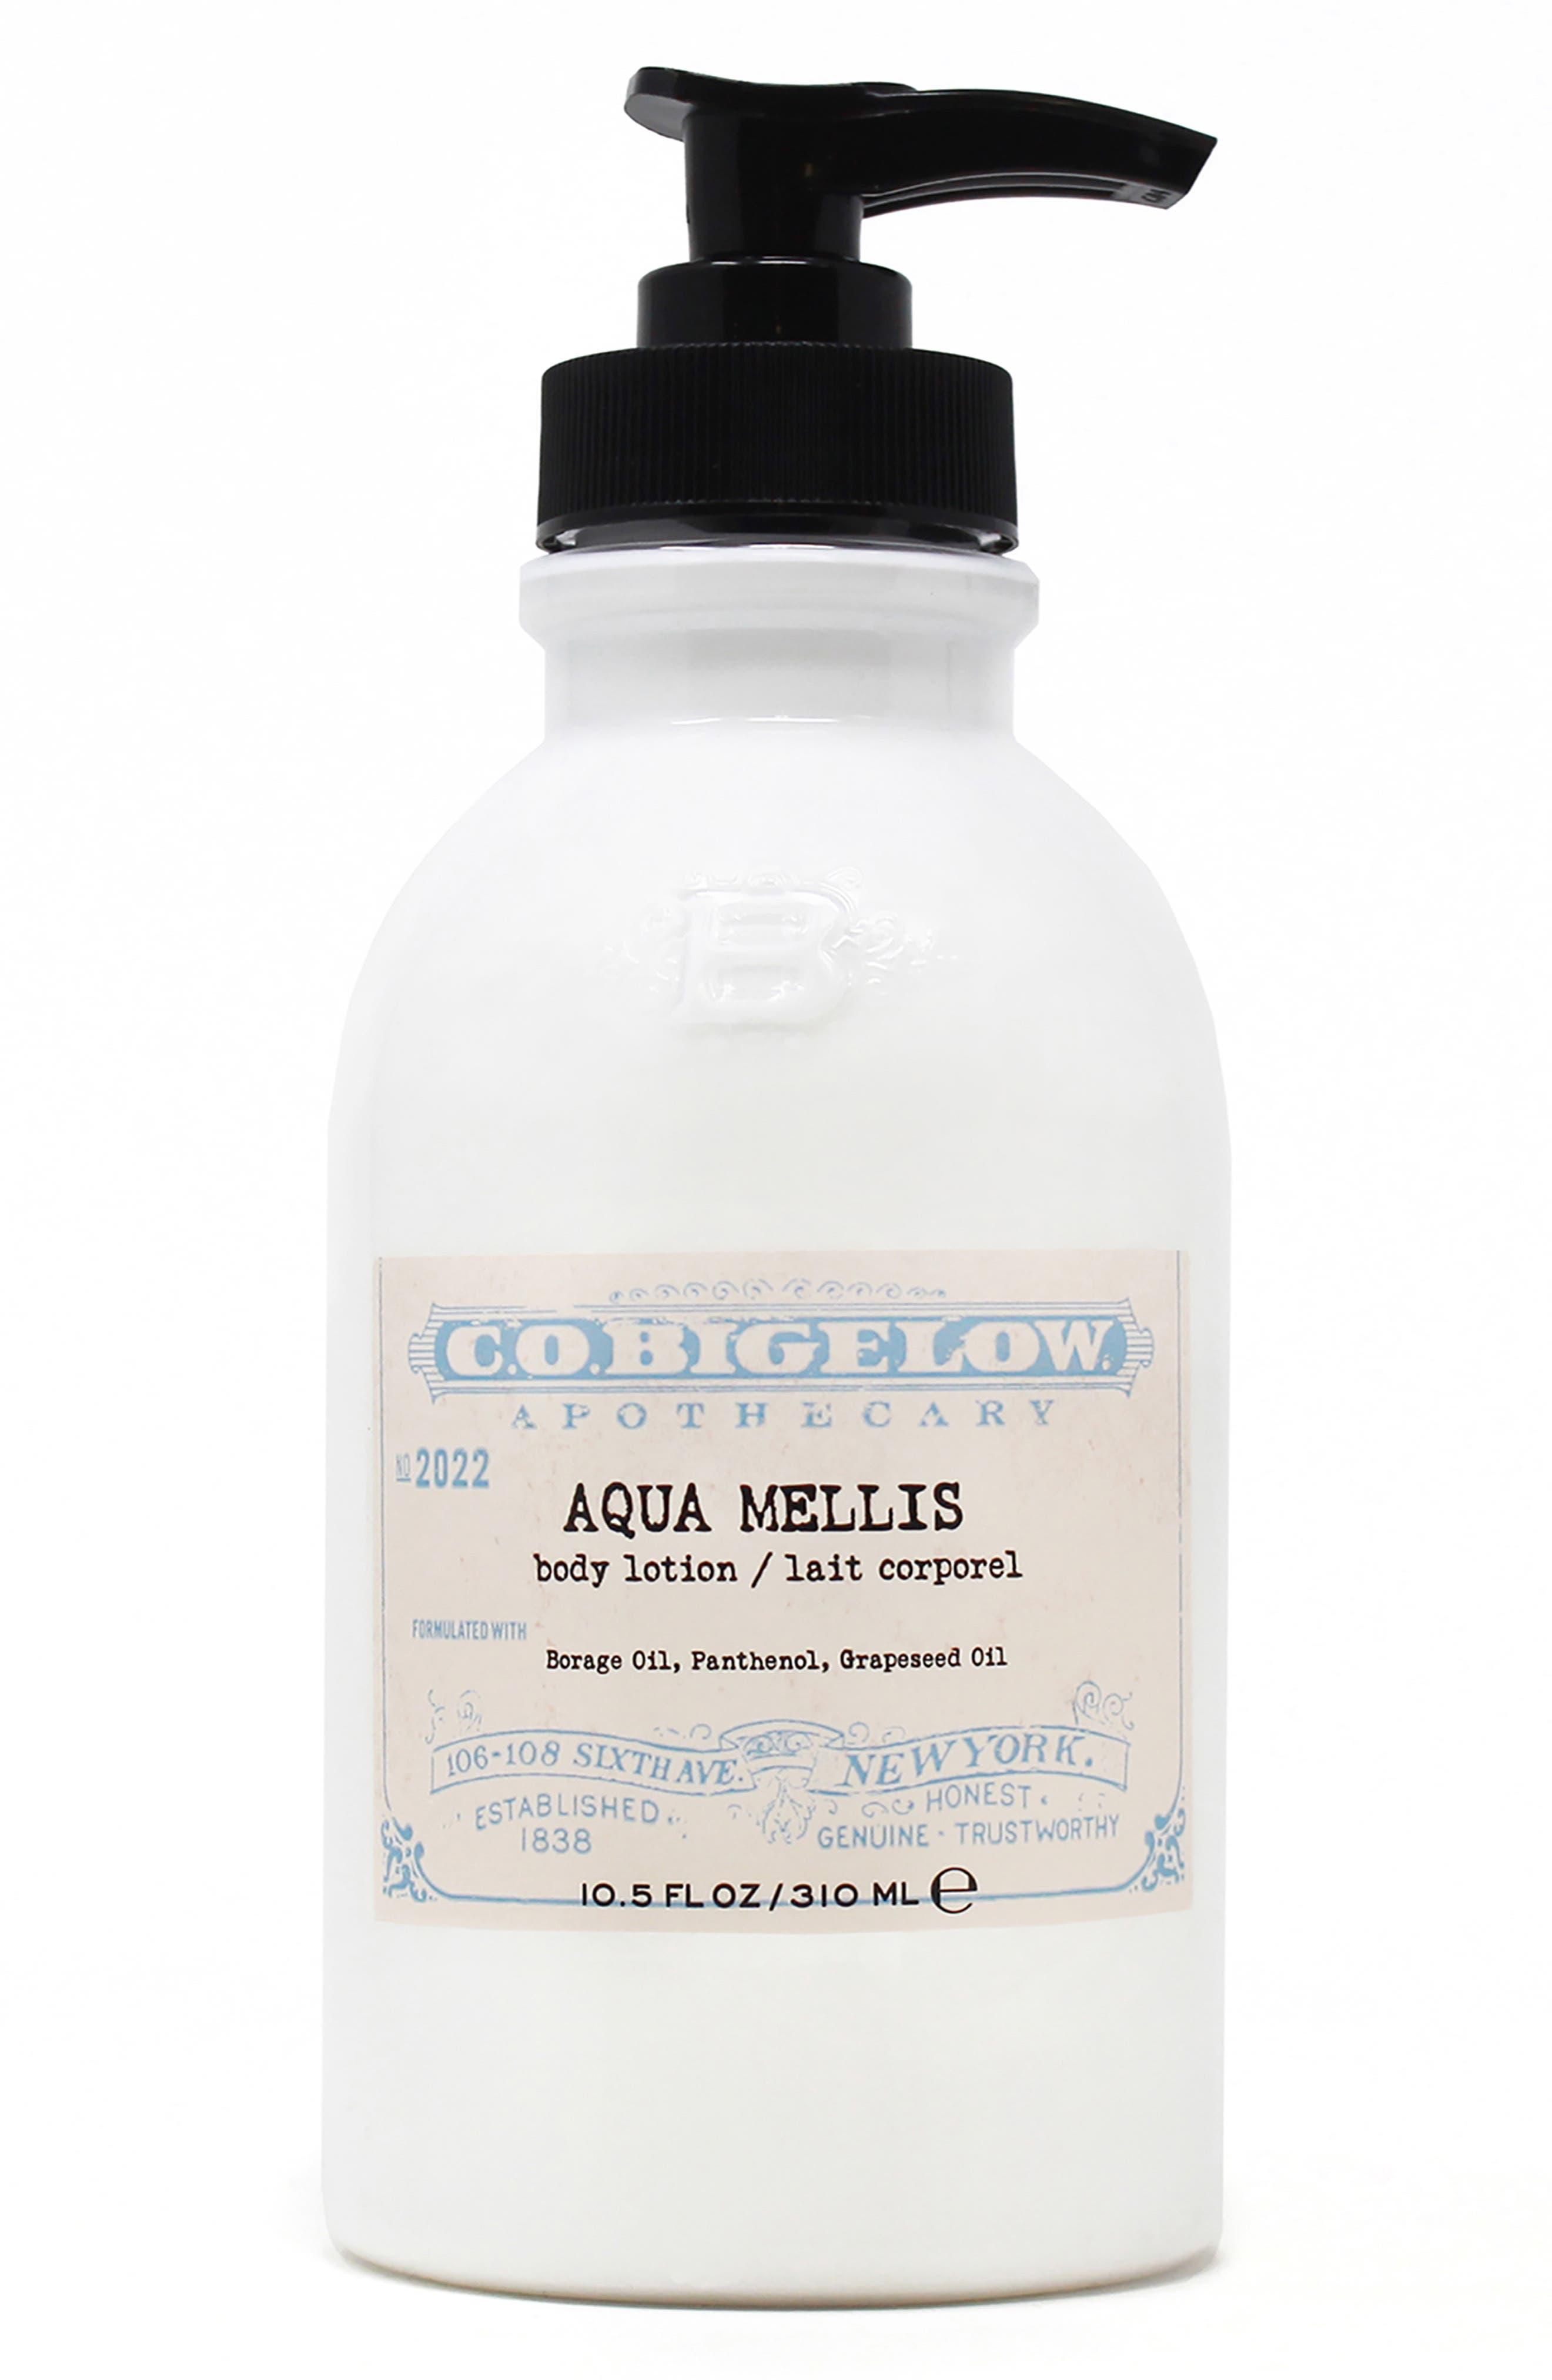 Aqua Mellis Body Lotion